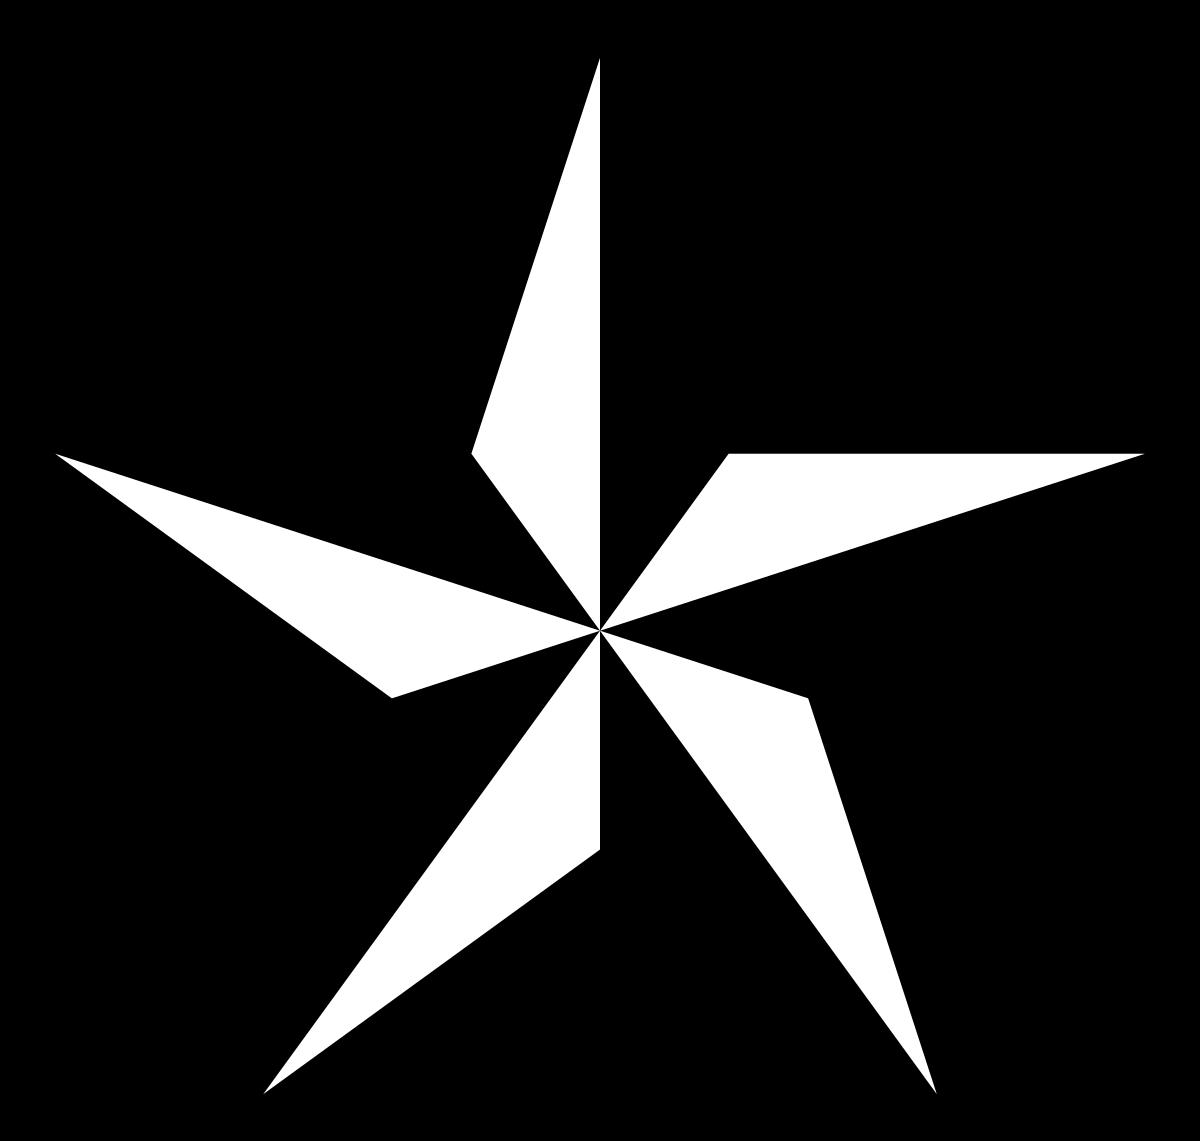 clipart stock Black and white clipart stars. Nautical star wikipedia